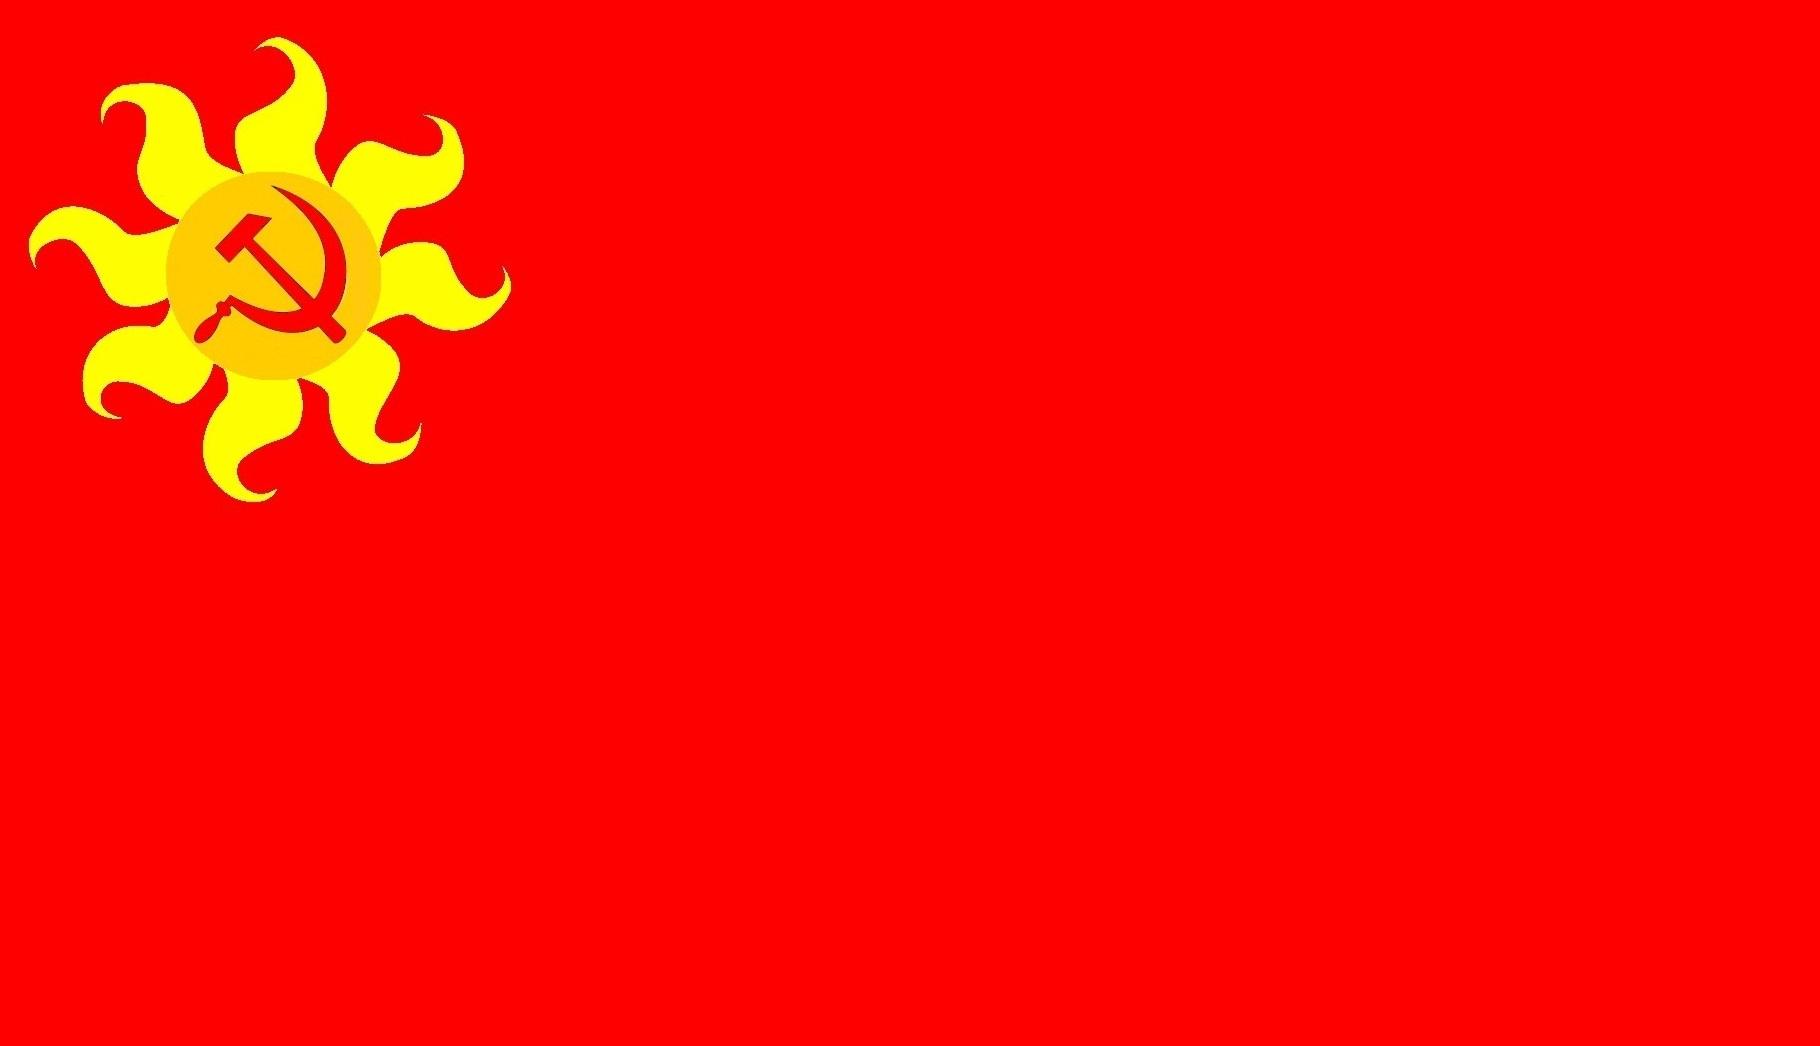 Ussr Flag Ww2 fashions-cloud com  Ussr Flag